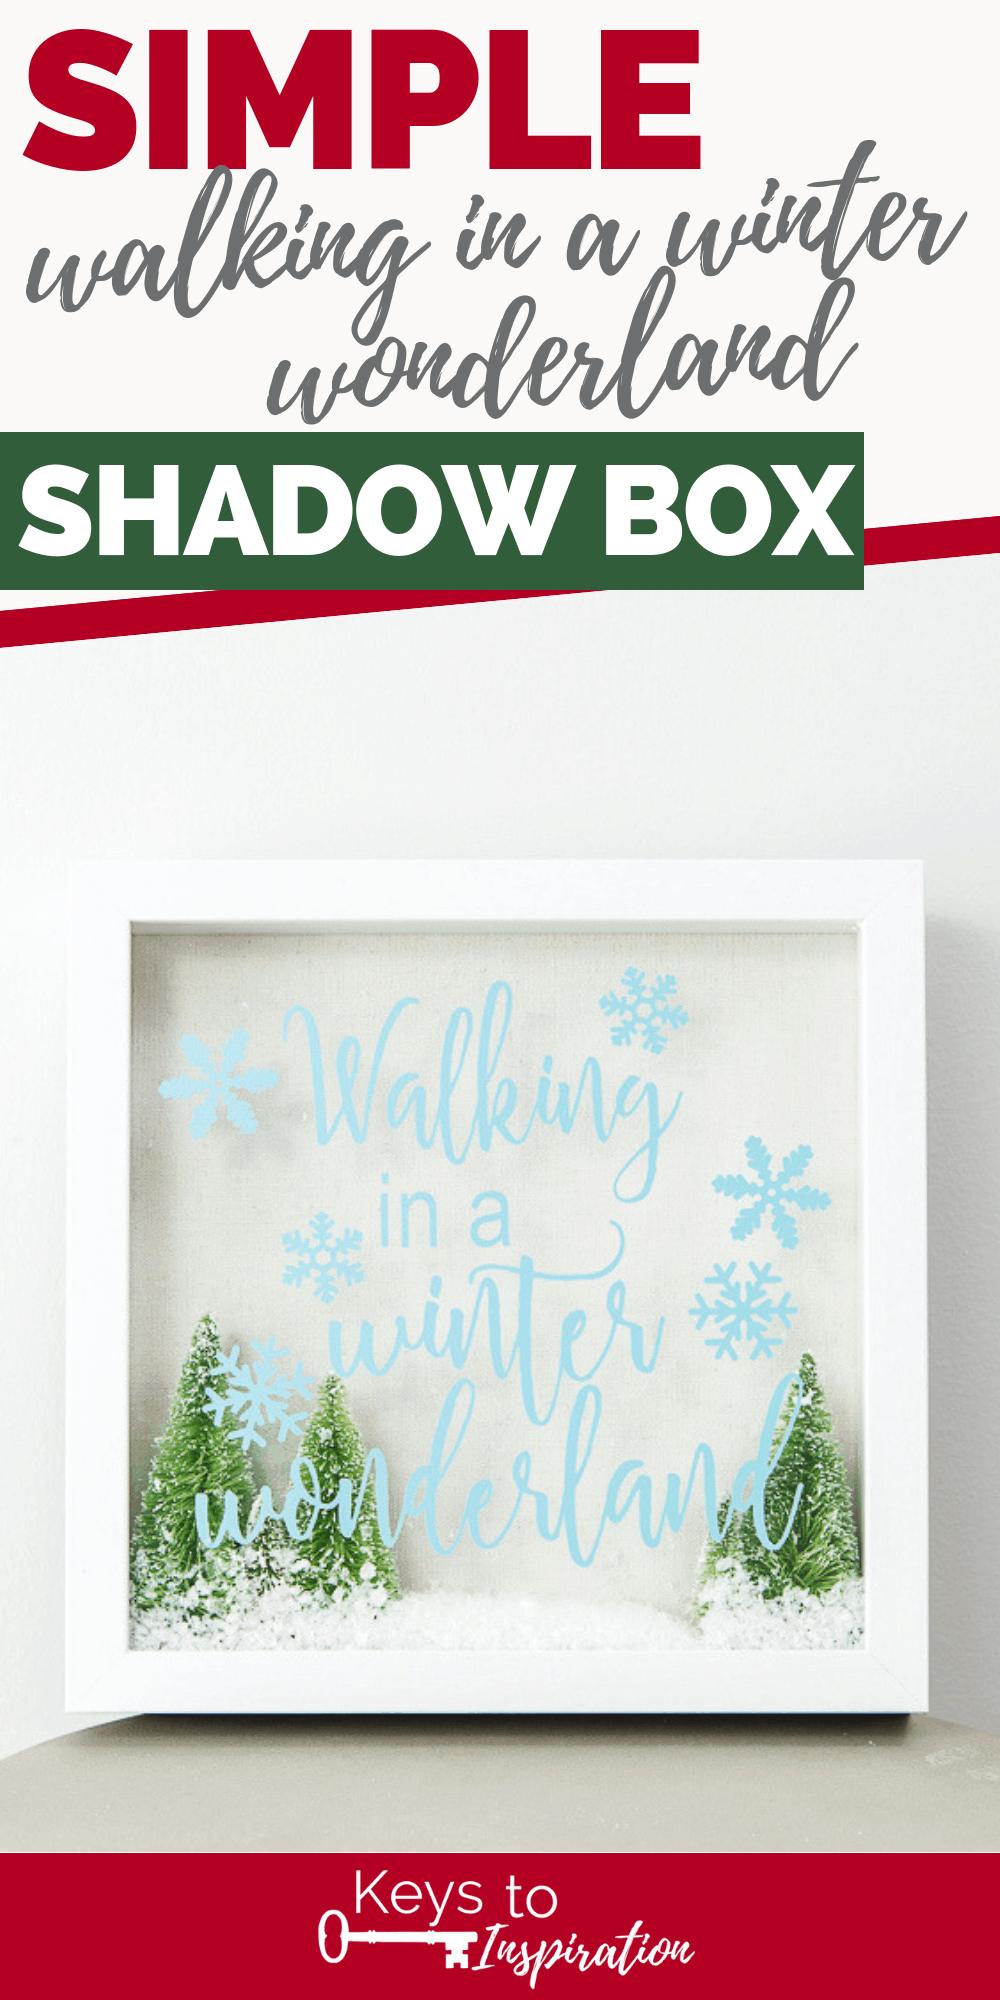 walking in a winter wonderland shadow box cricut project